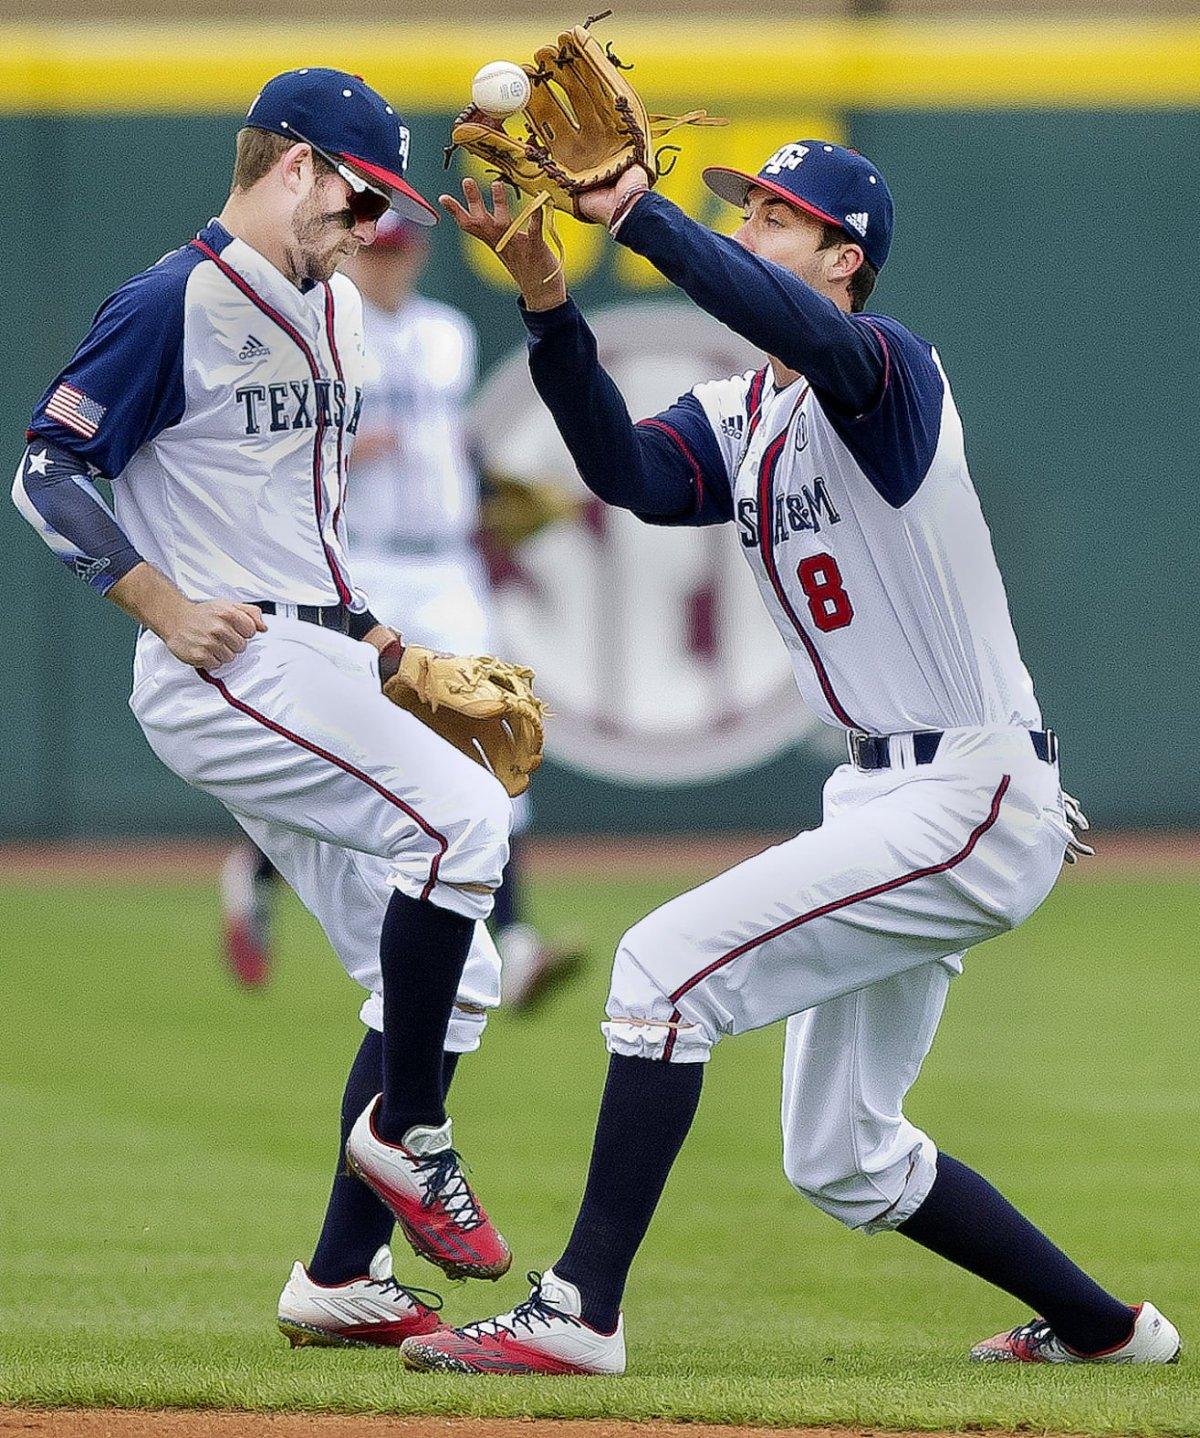 Texas A&M Baseball Uniforms 2018